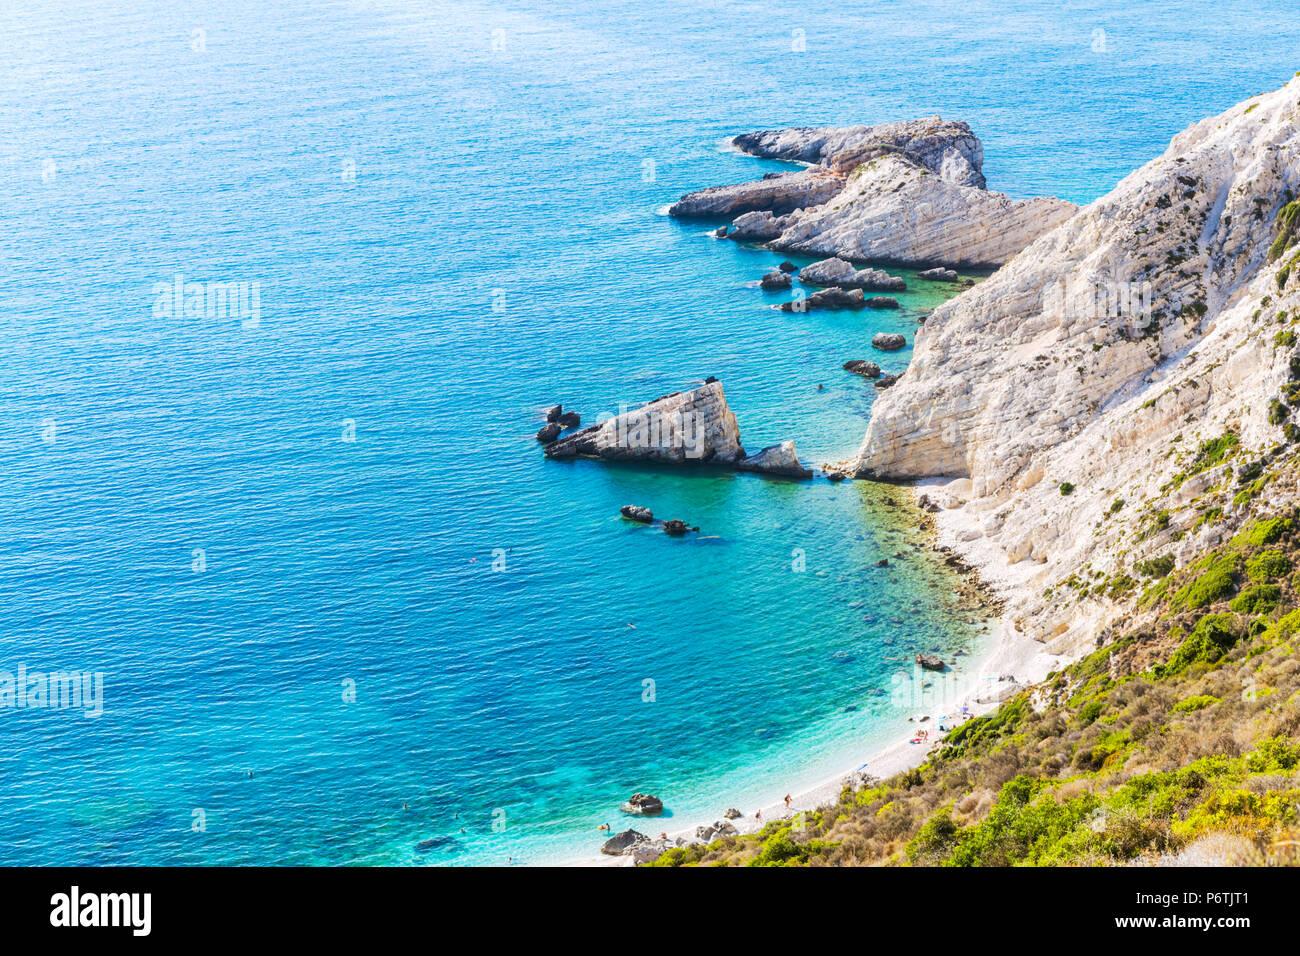 Coastline of the beautiful island of Kefalonia. Kefalonia, Greek Islands, Greece - Stock Image